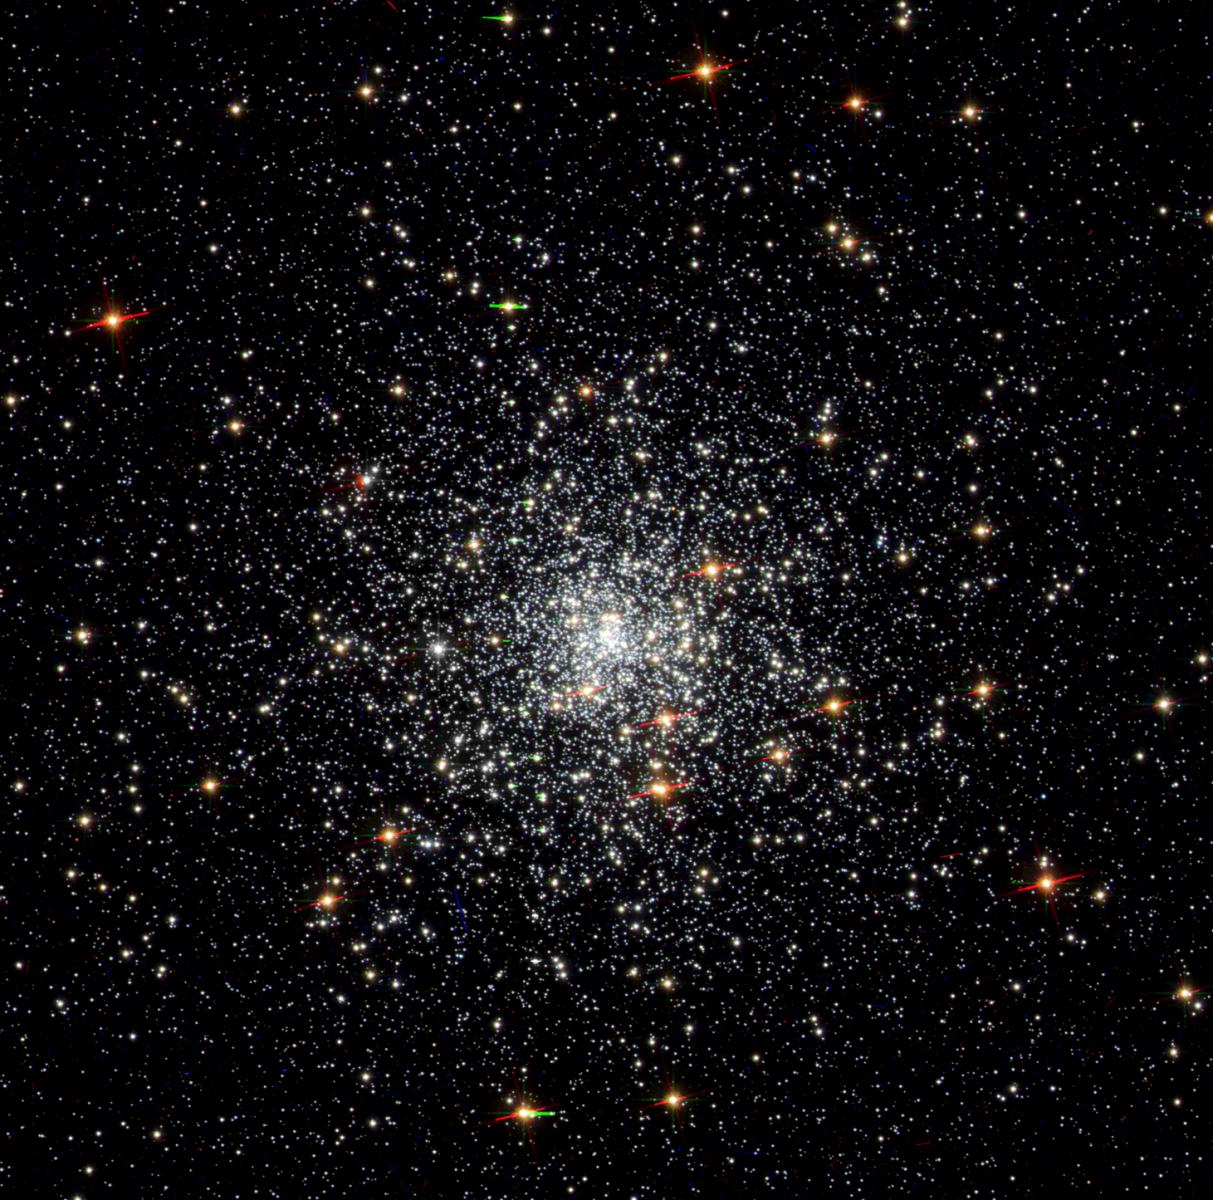 NGC_6624_HST_10573_R814G606B435.edit